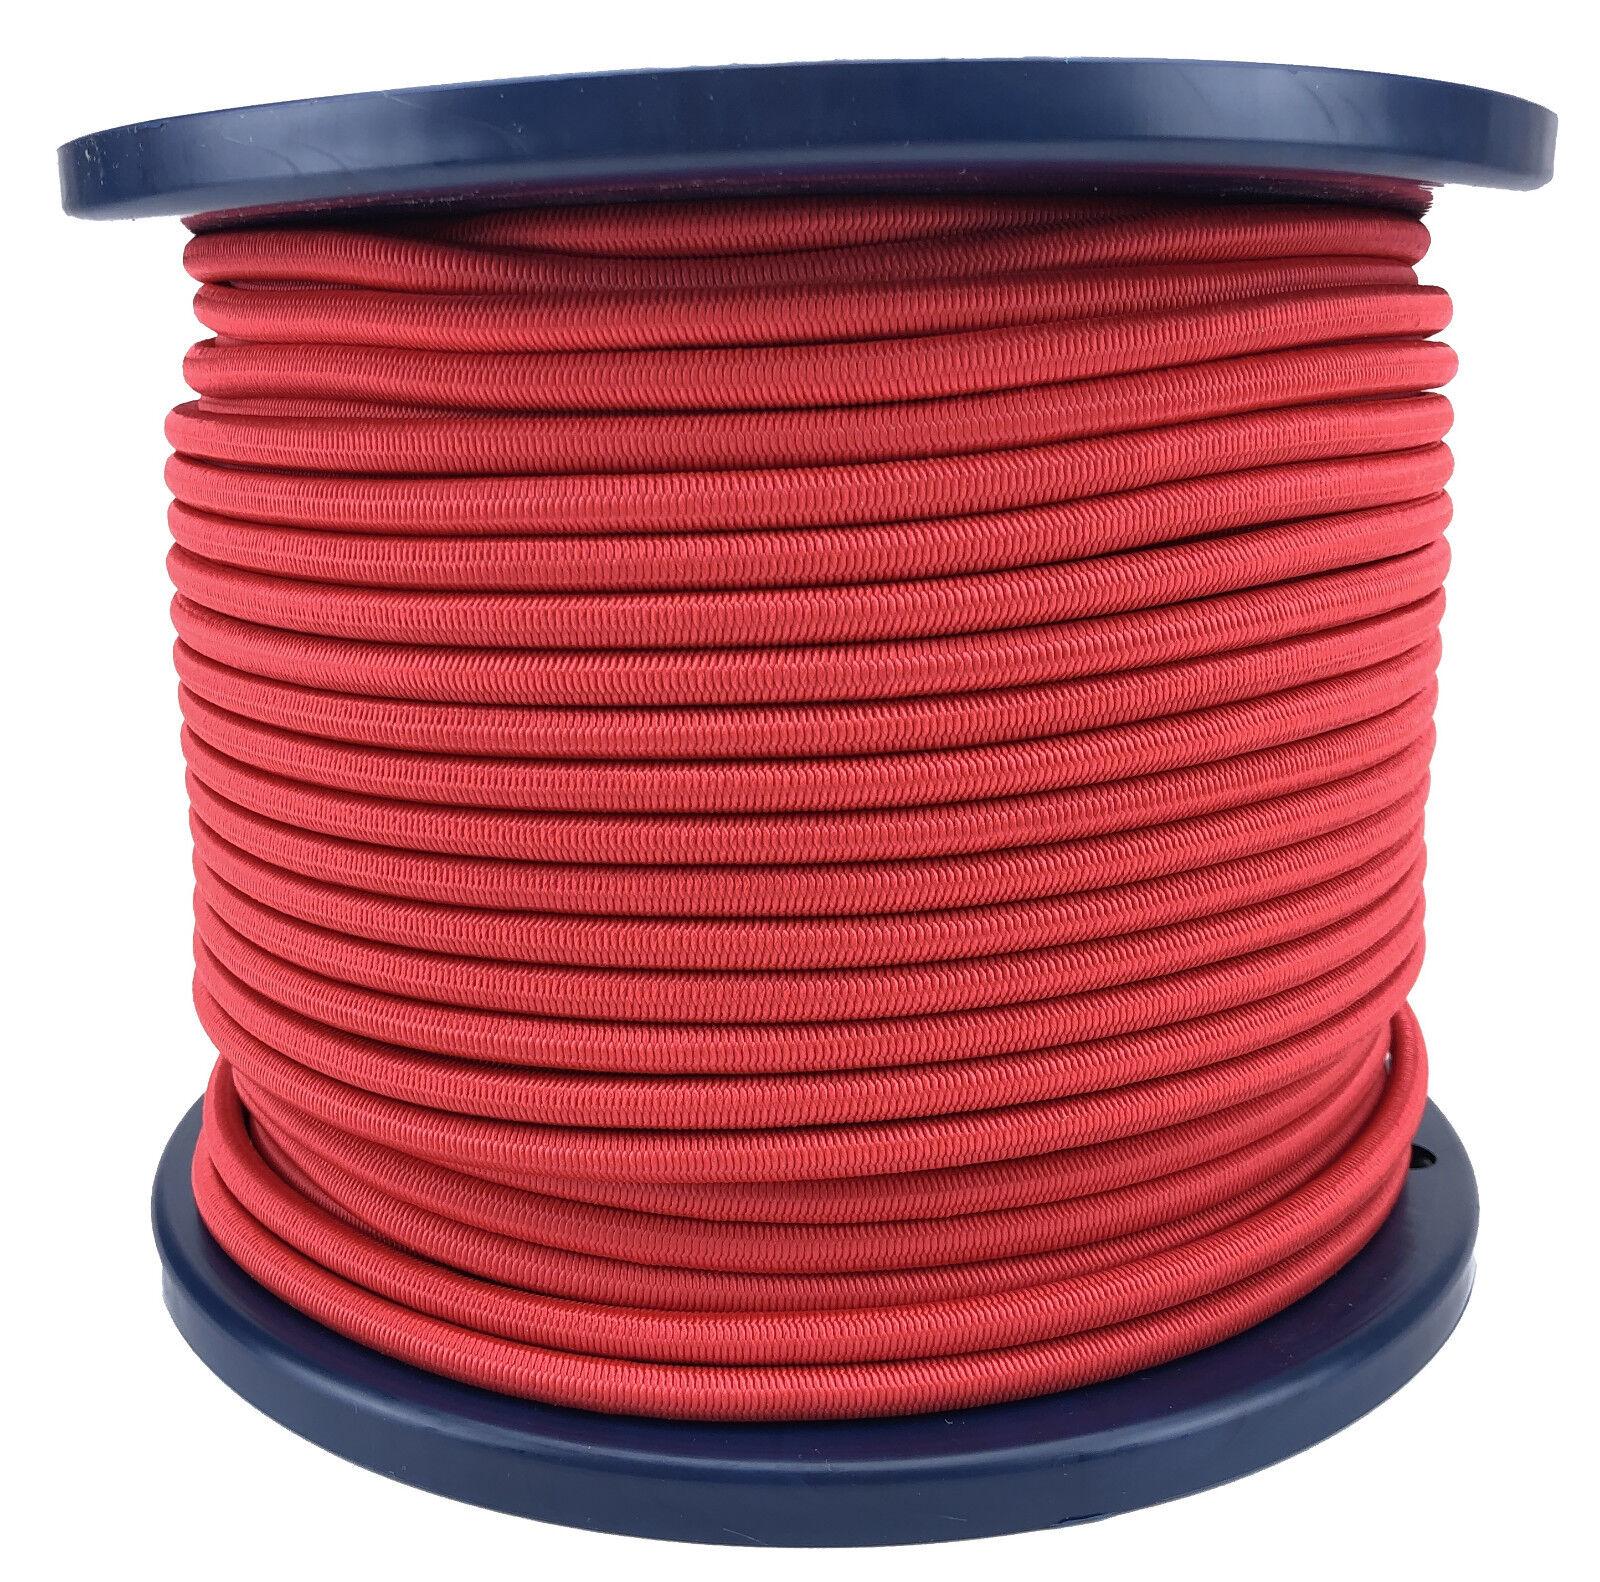 6mm Rot Elastischer Gummizug Seil Gummiseil Festbinden UV Stabil